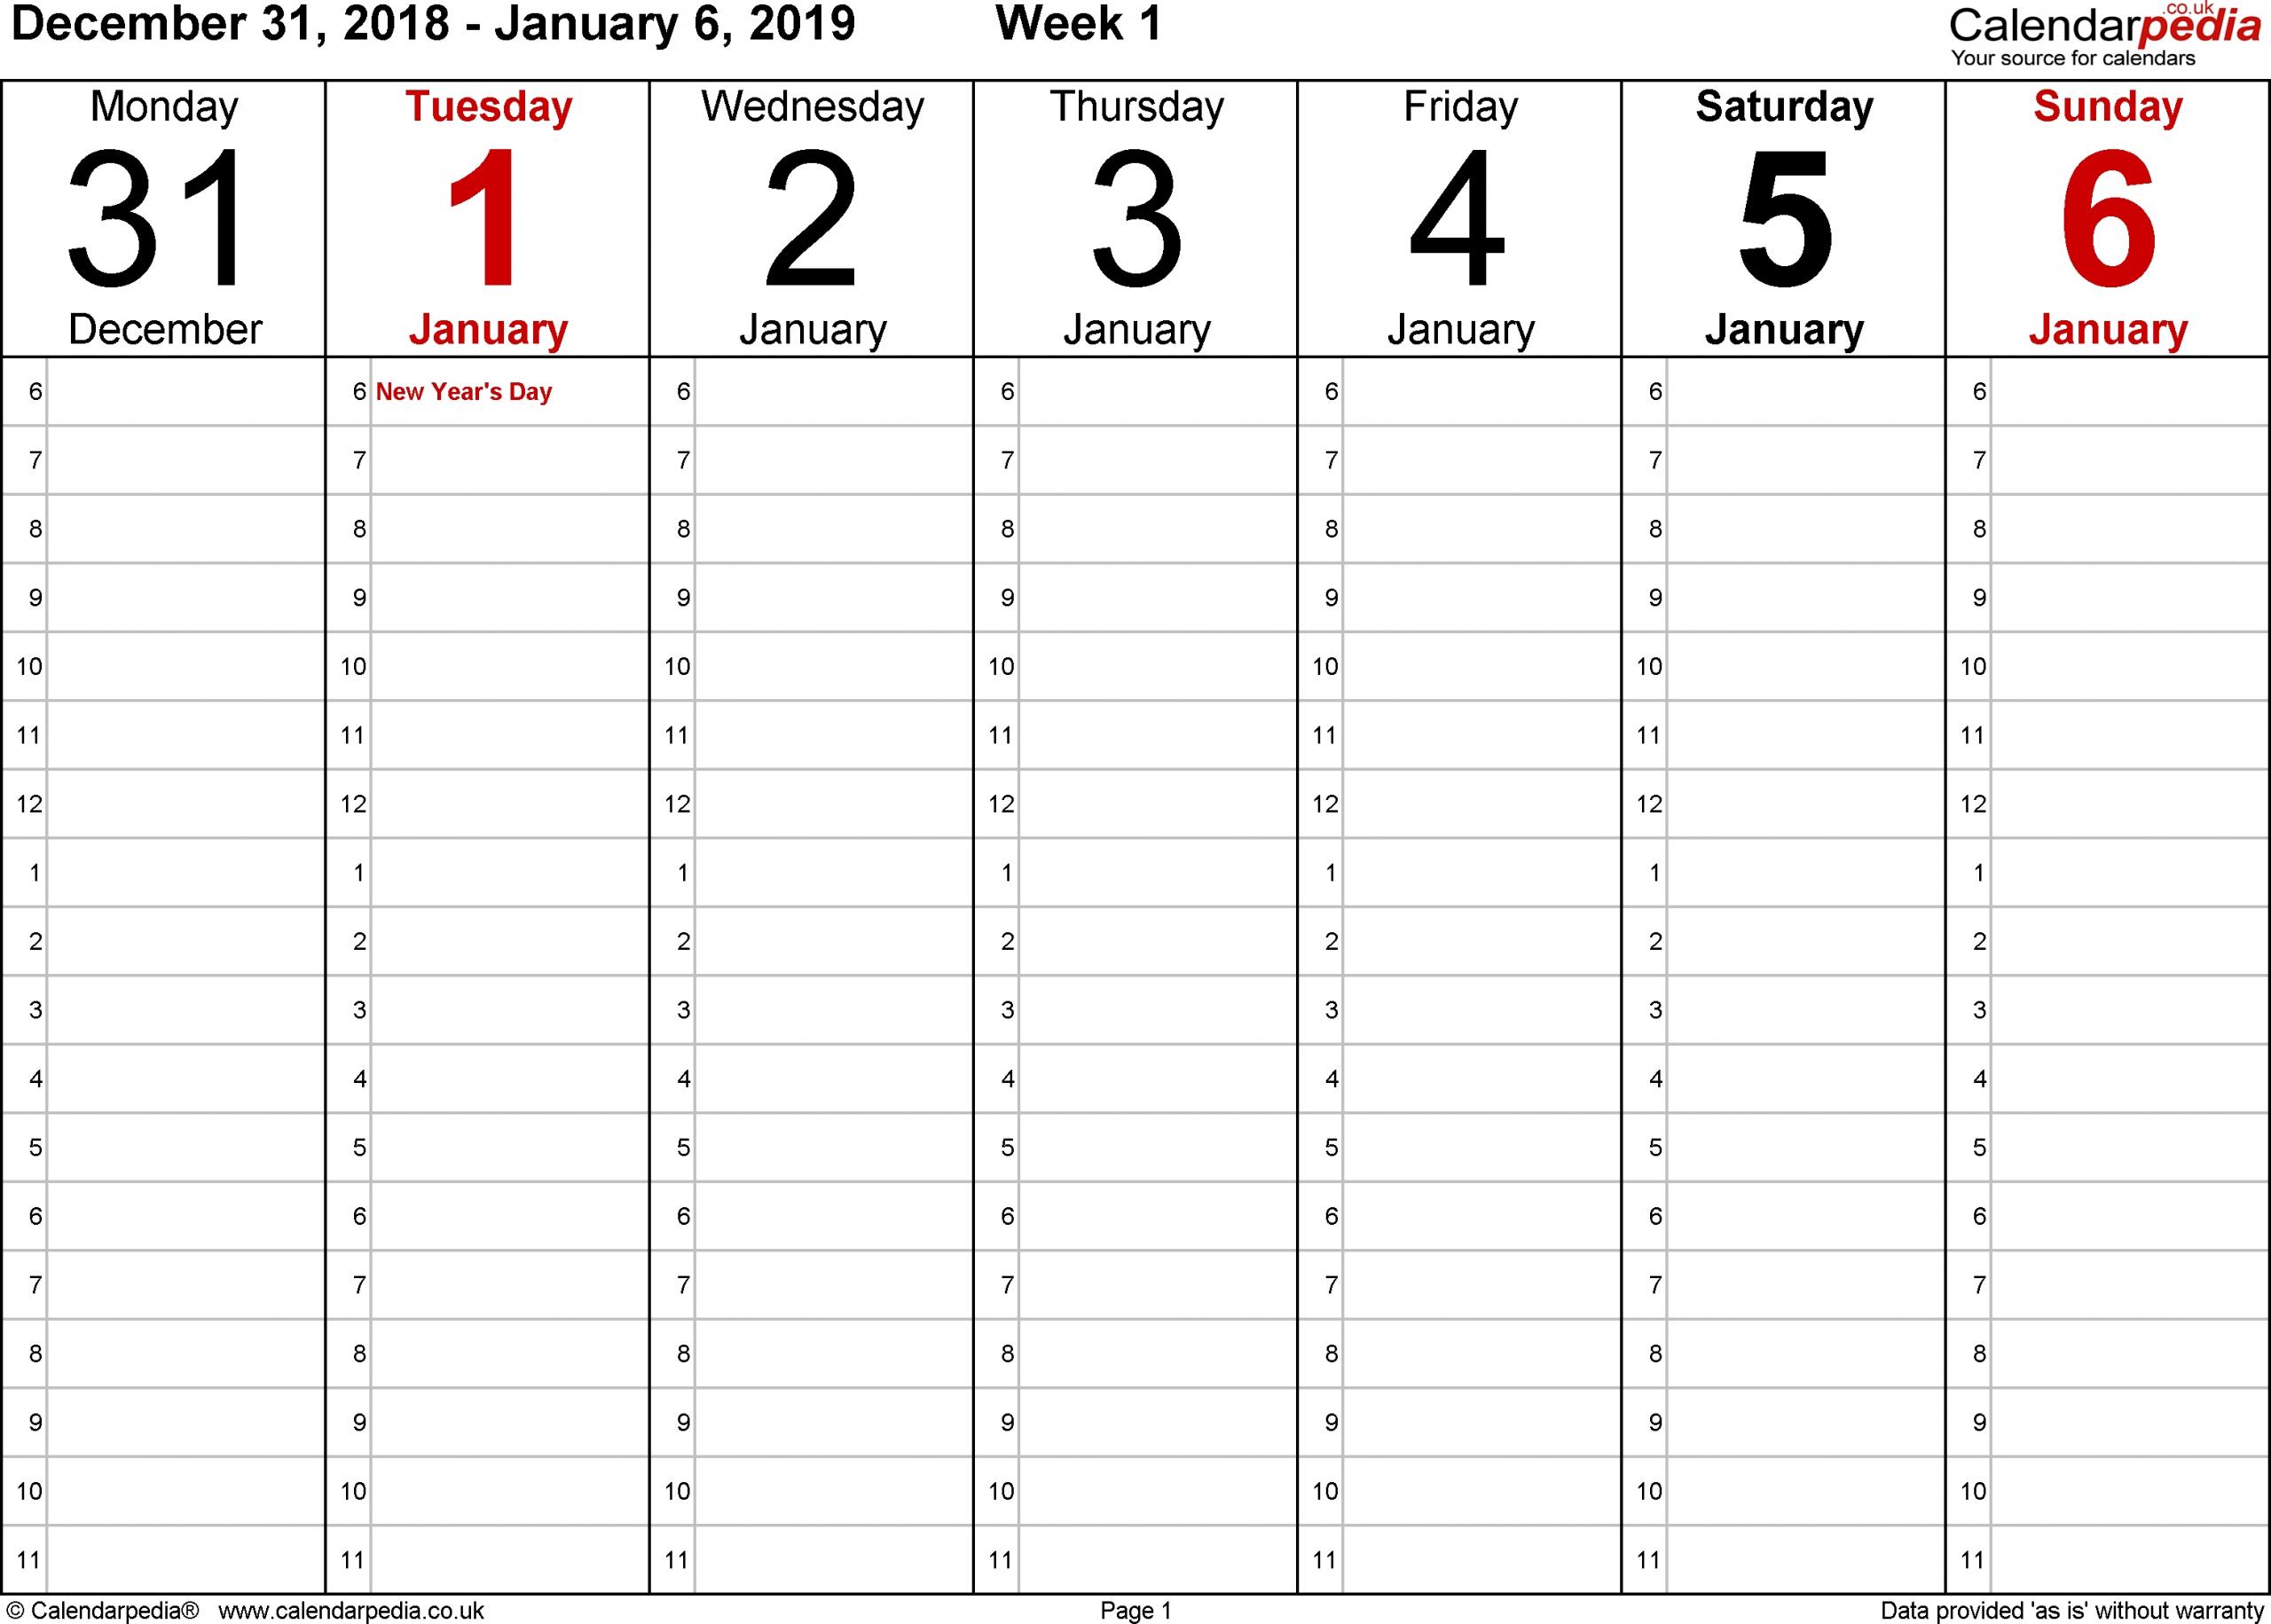 Daily Calendar Pdf 2019 | Daily Calendar Printable 2019